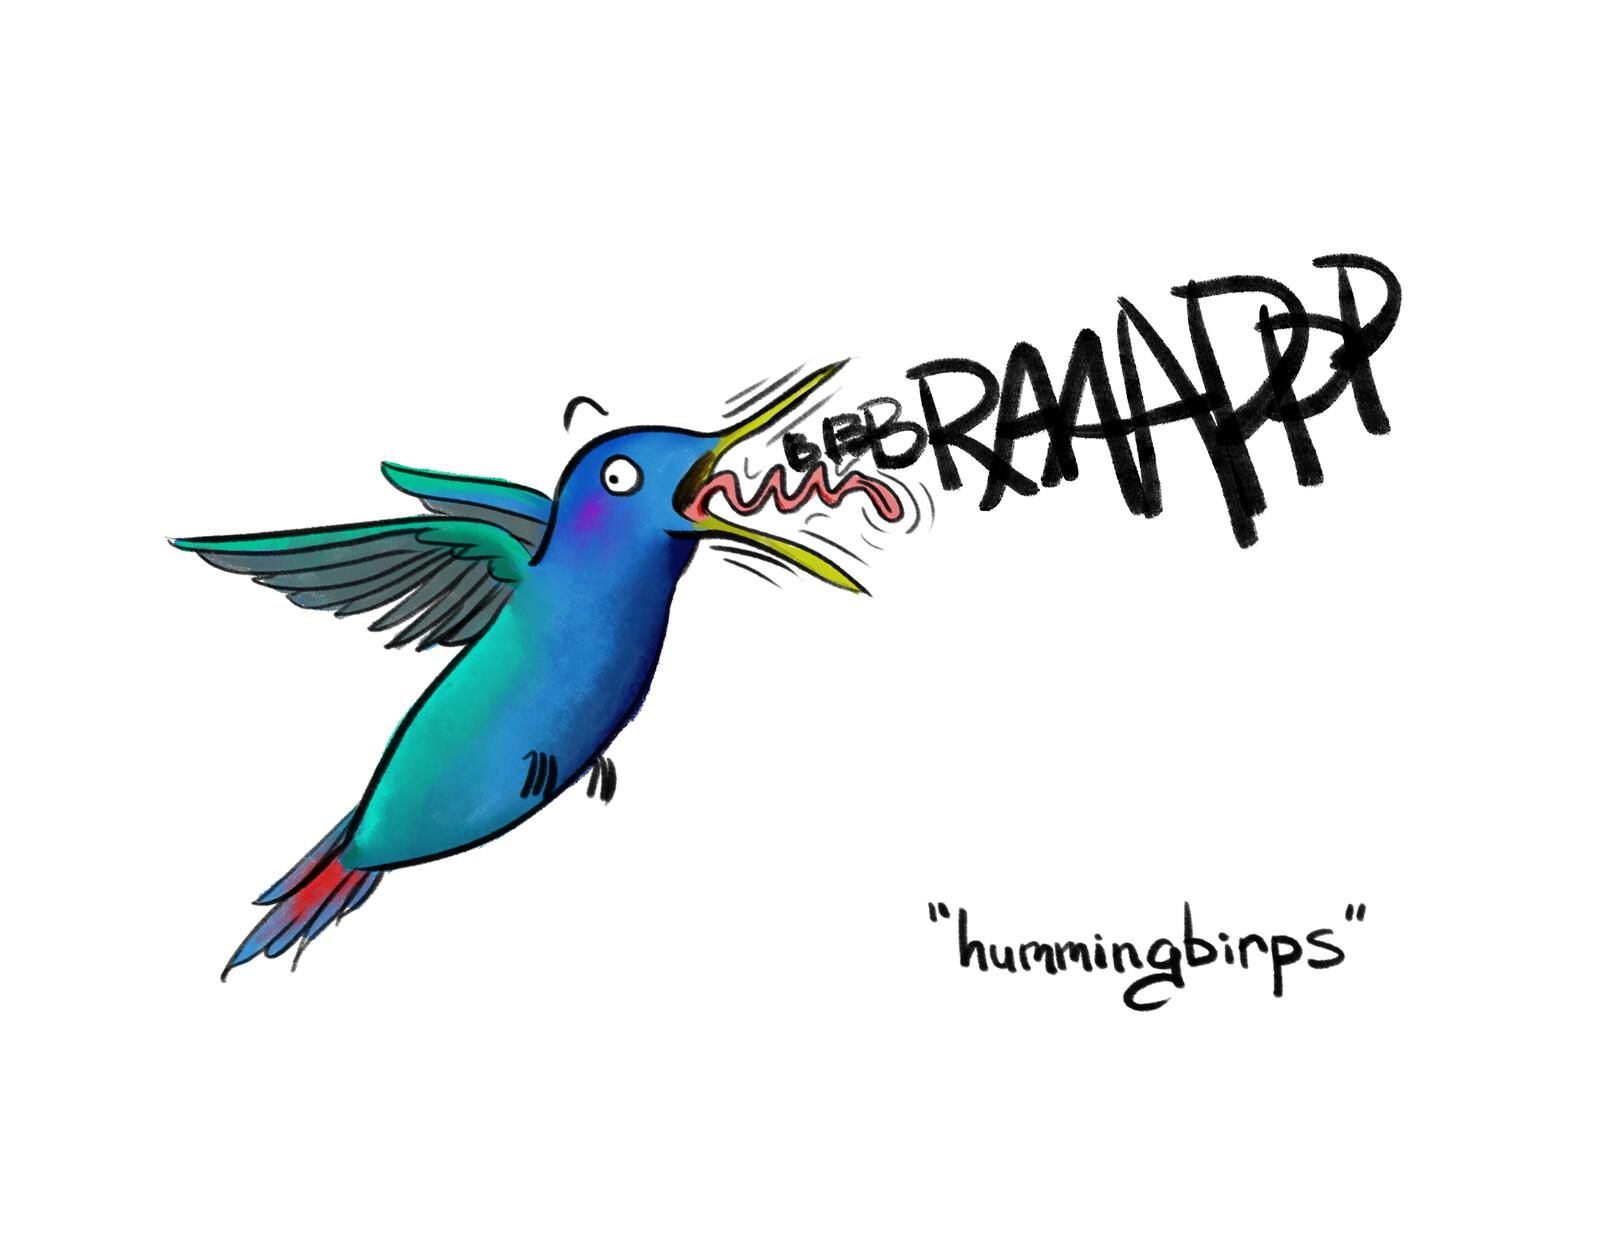 Hummingbirps